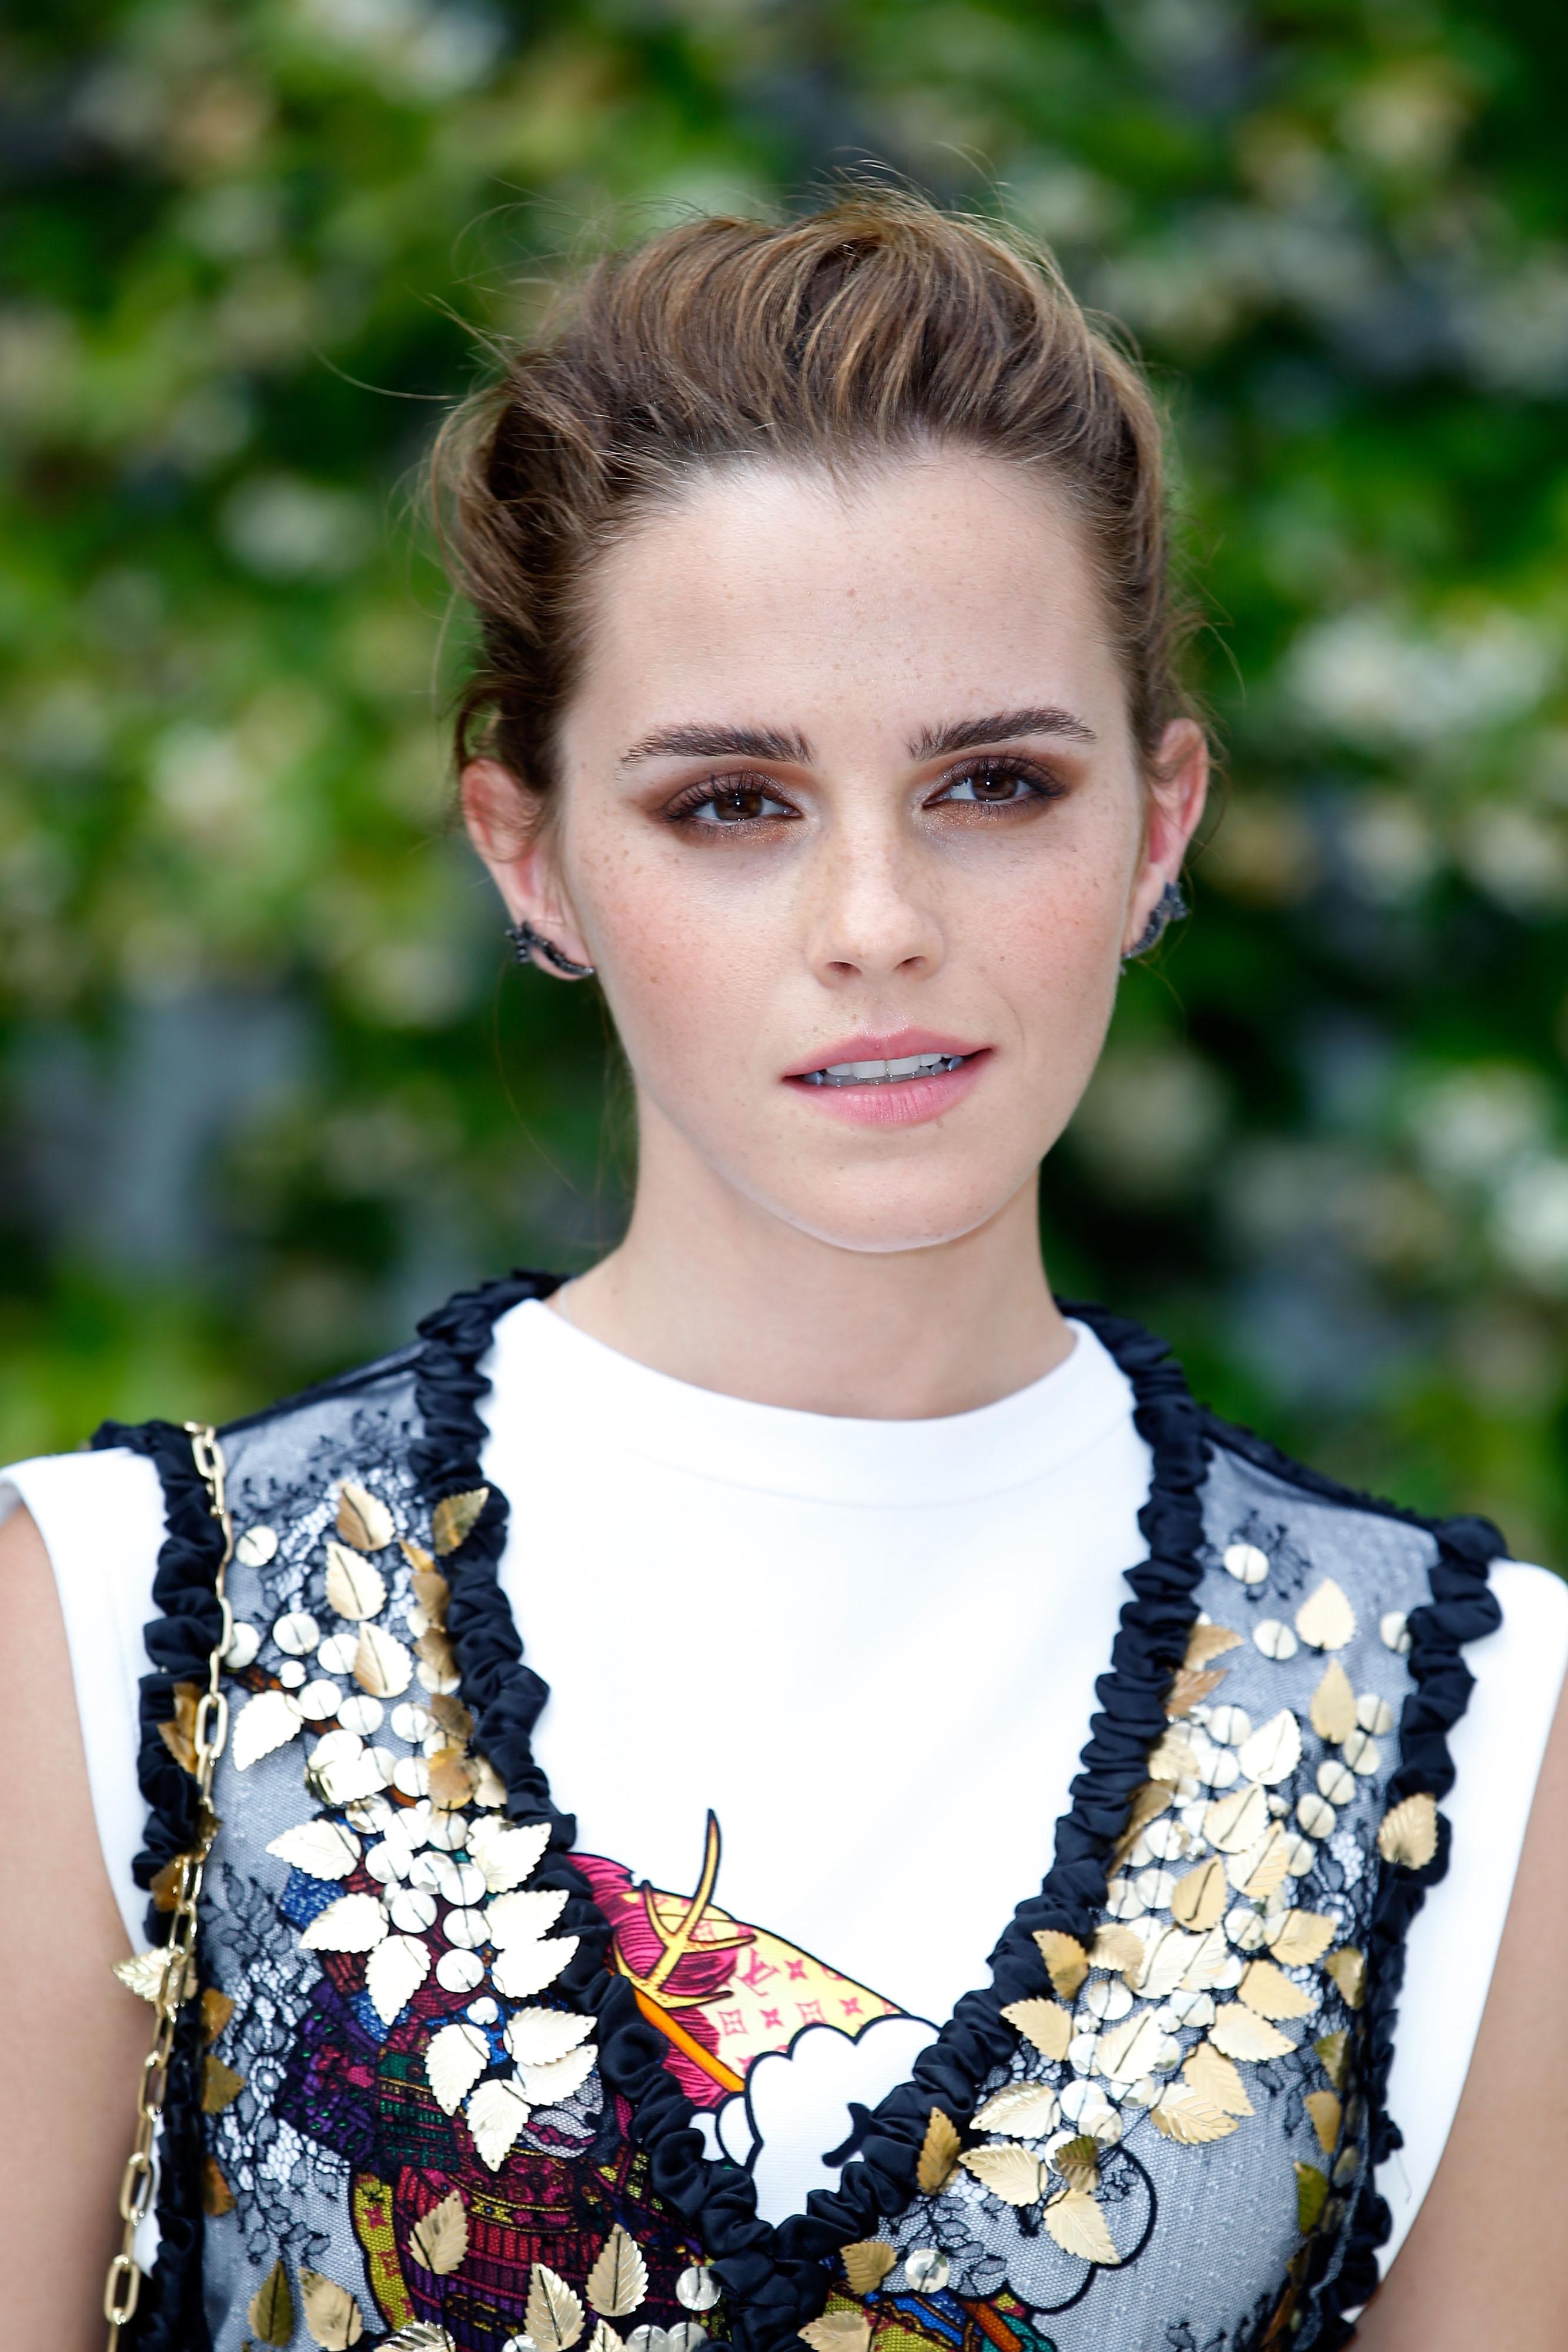 AB Emma Watson Getty Images